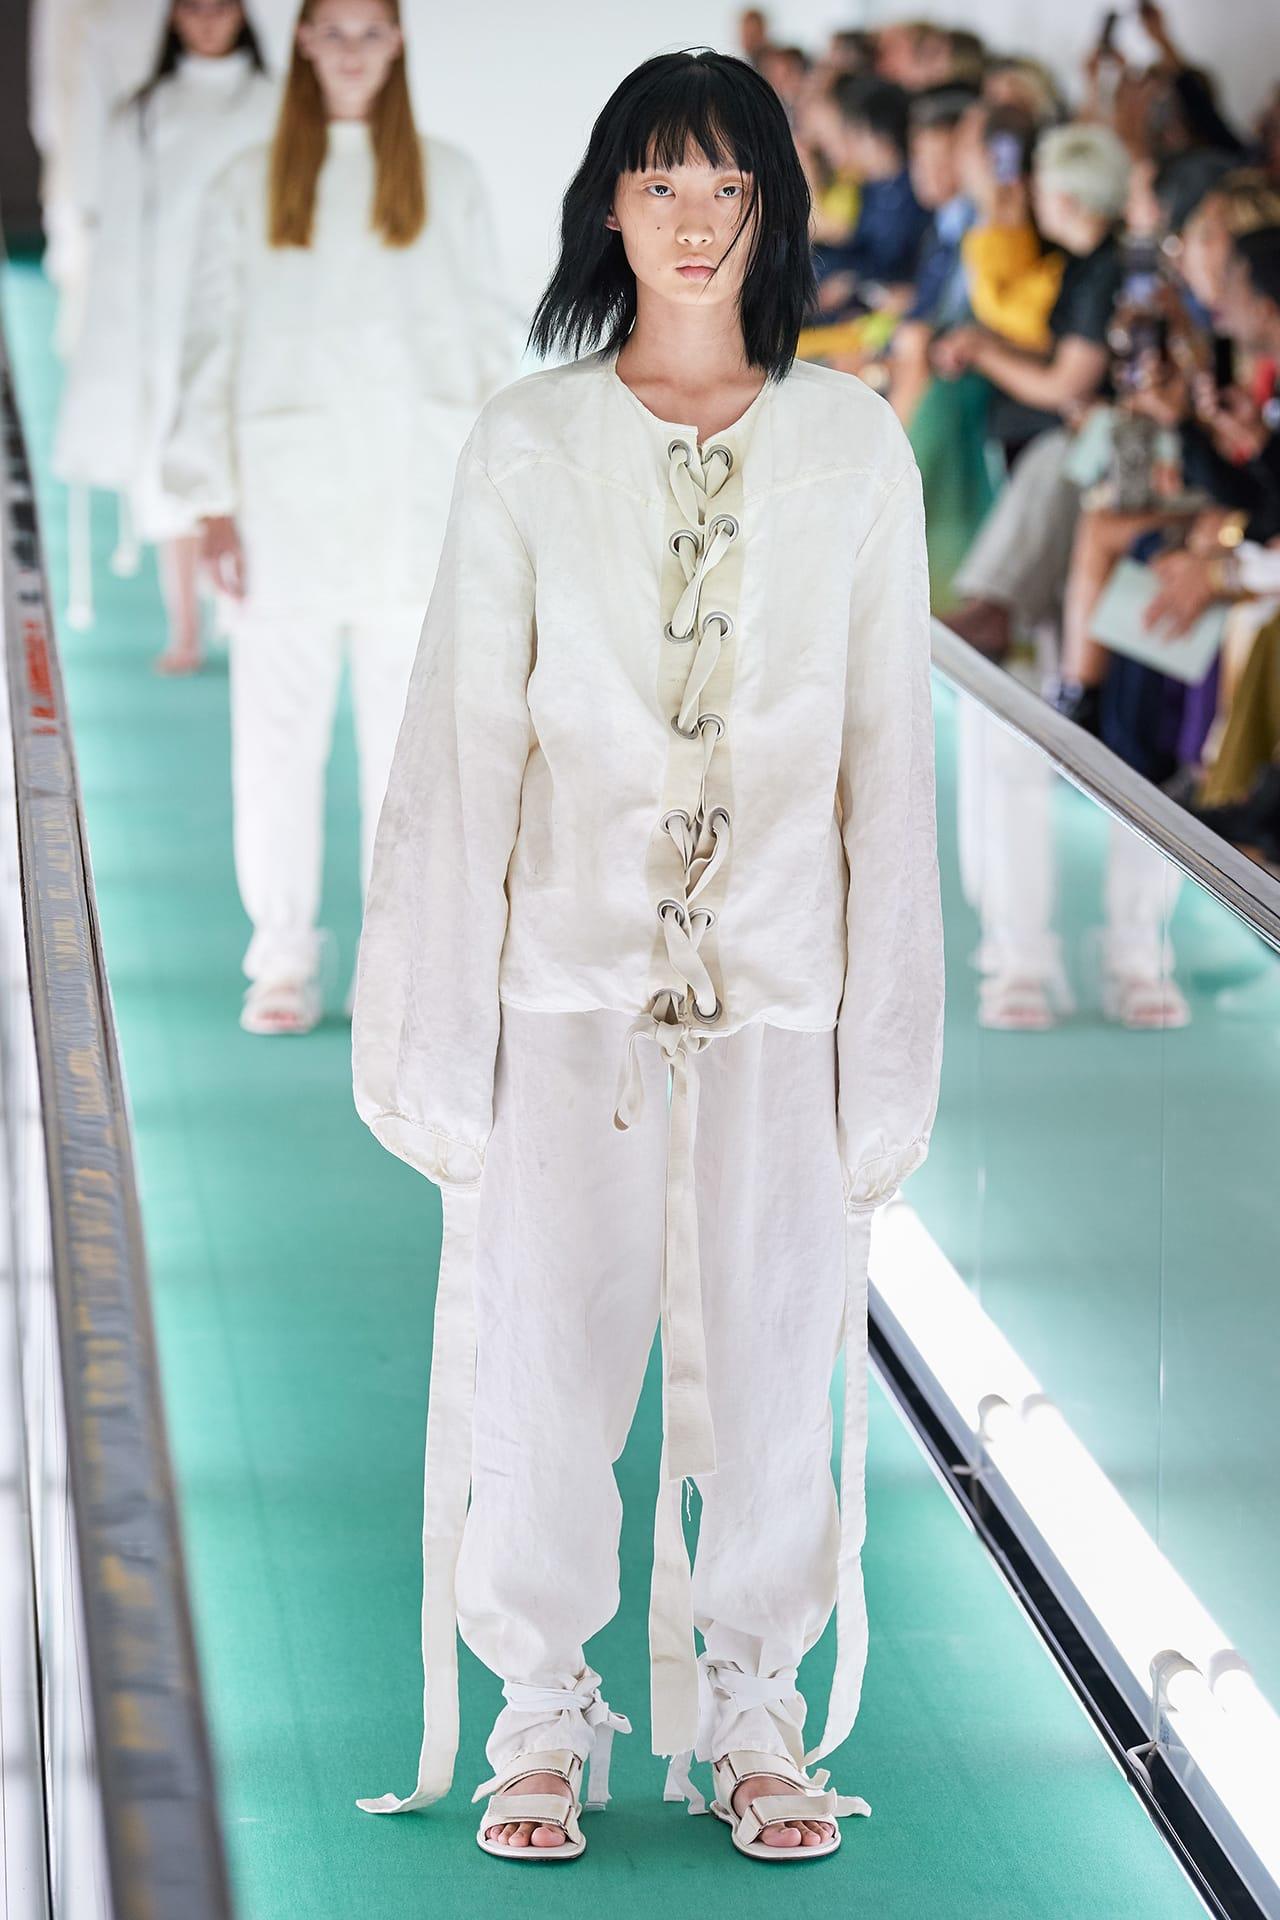 Gucci Model Yaya Bones Mental Health Protest